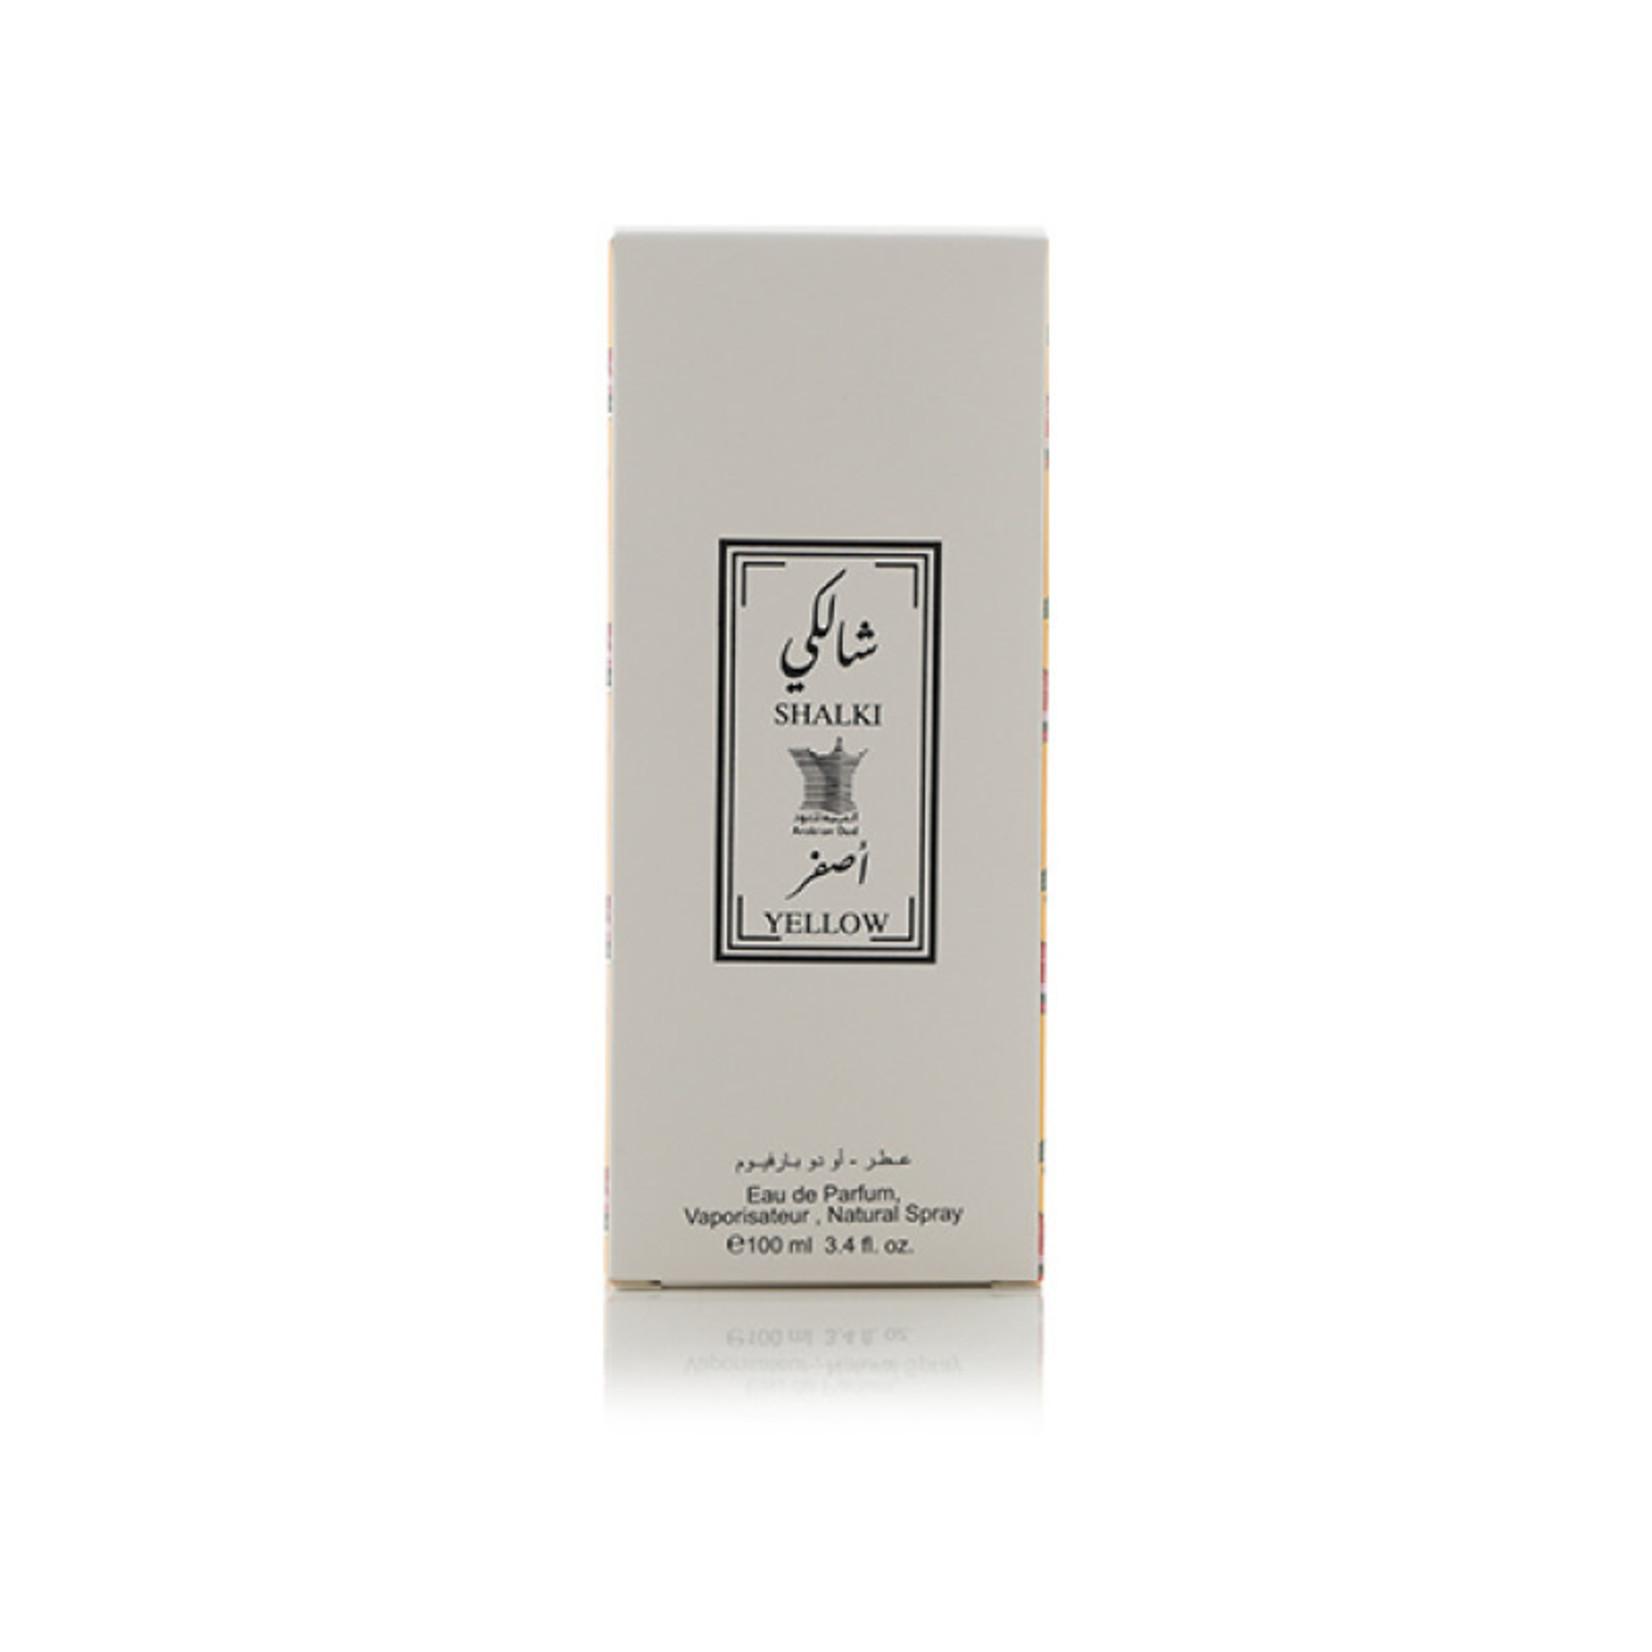 Shalki Yellow - 100 ml Eau De Parfum